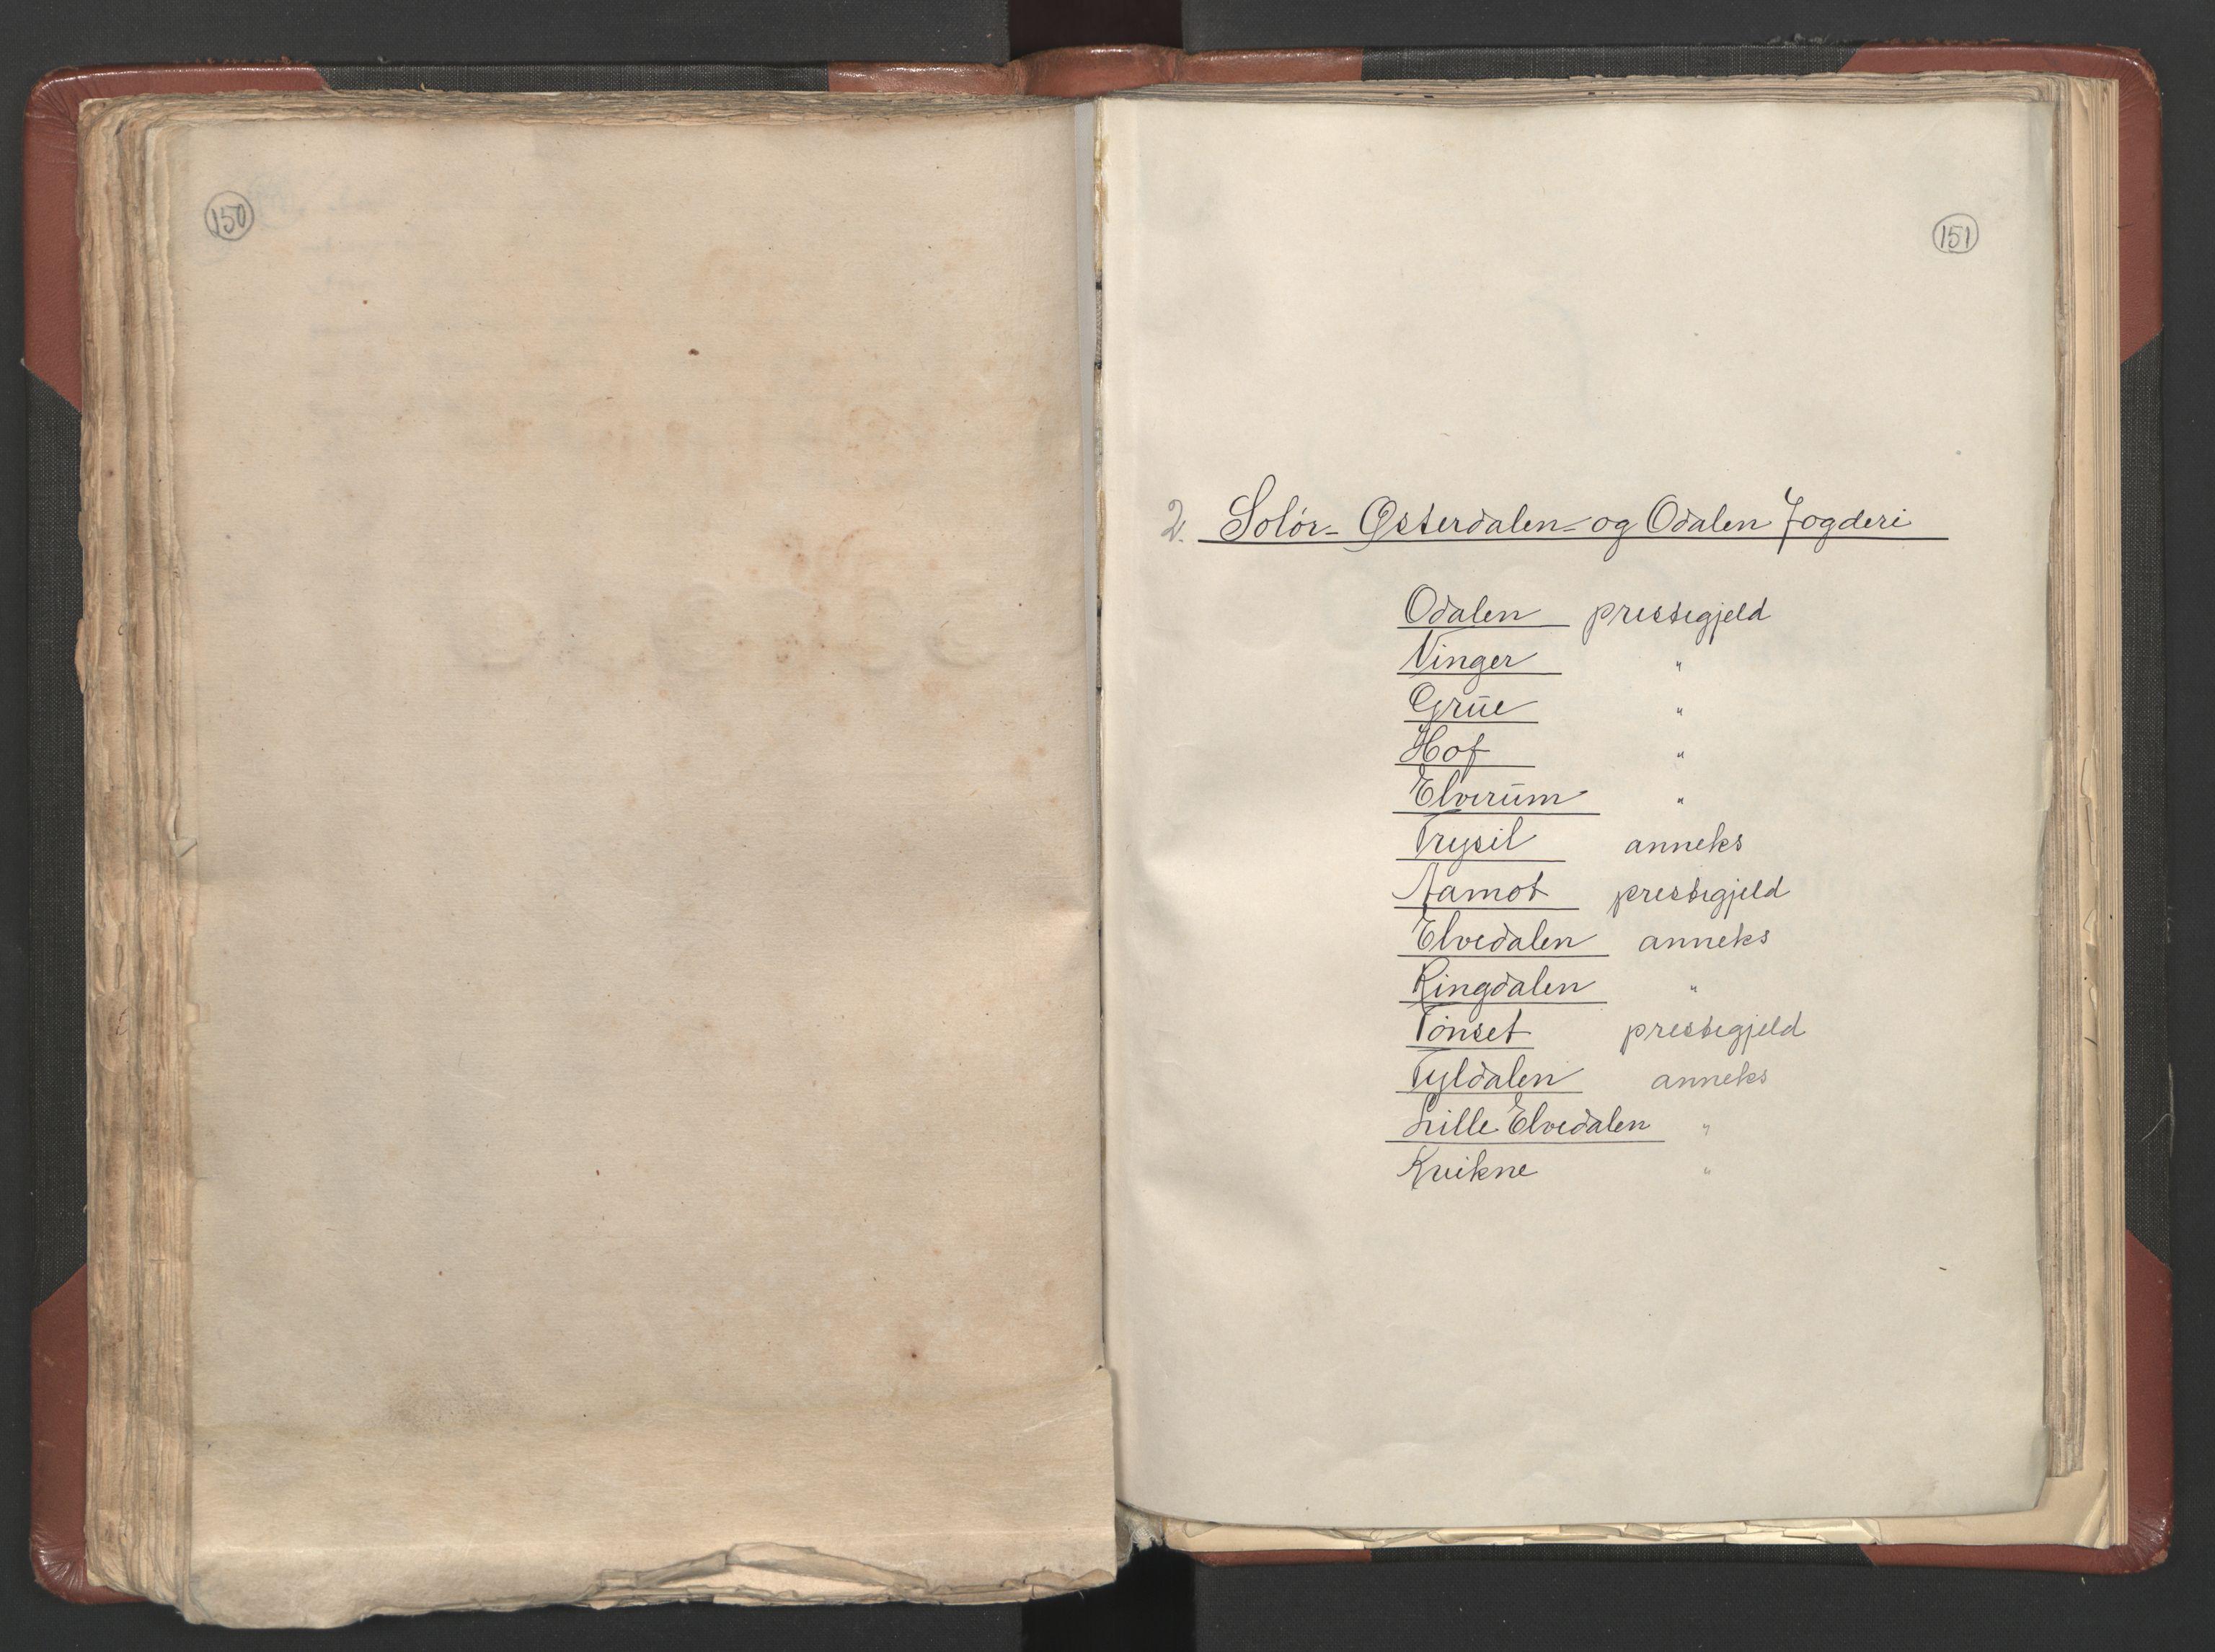 RA, Fogdenes og sorenskrivernes manntall 1664-1666, nr. 3: Hedmark fogderi og Solør, Østerdal og Odal fogderi, 1664, s. 150-151